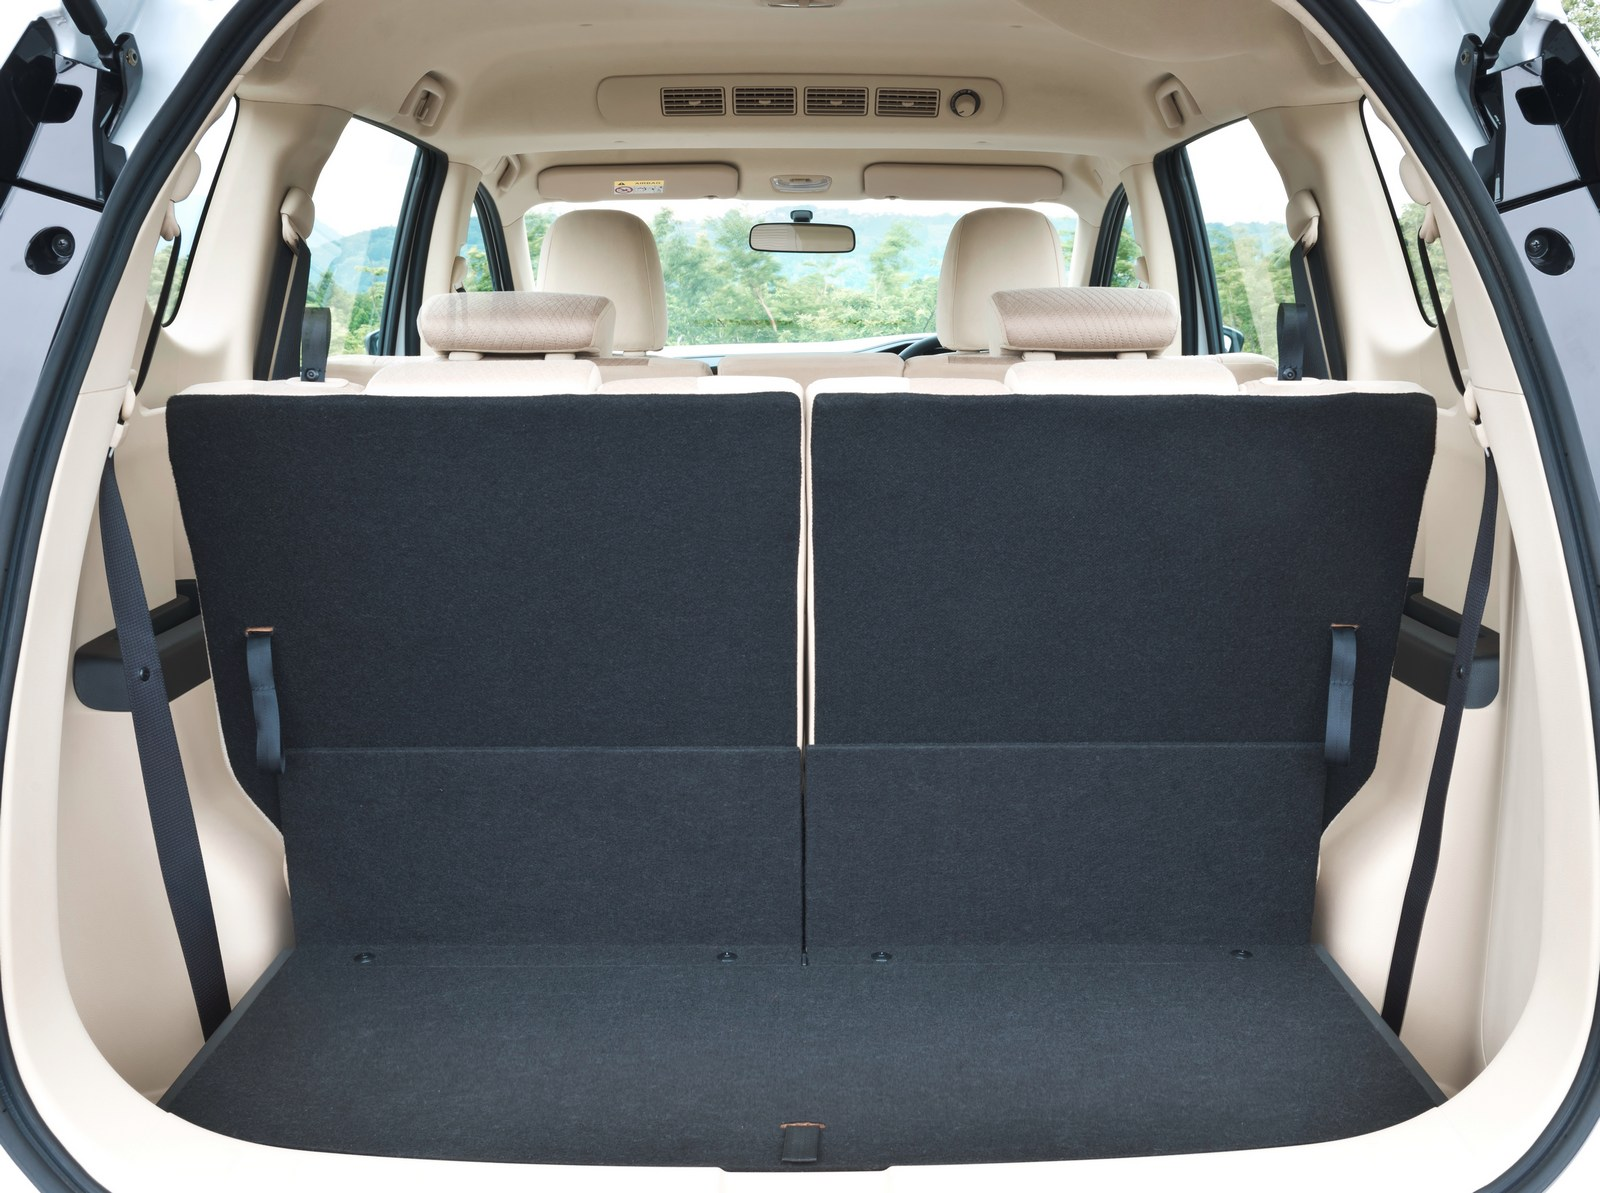 Pajero 2018 Model >> 2019 Mitsubishi L200 (Triton) Facelift Flaunts Dynamic Shield Design Elements - autoevolution